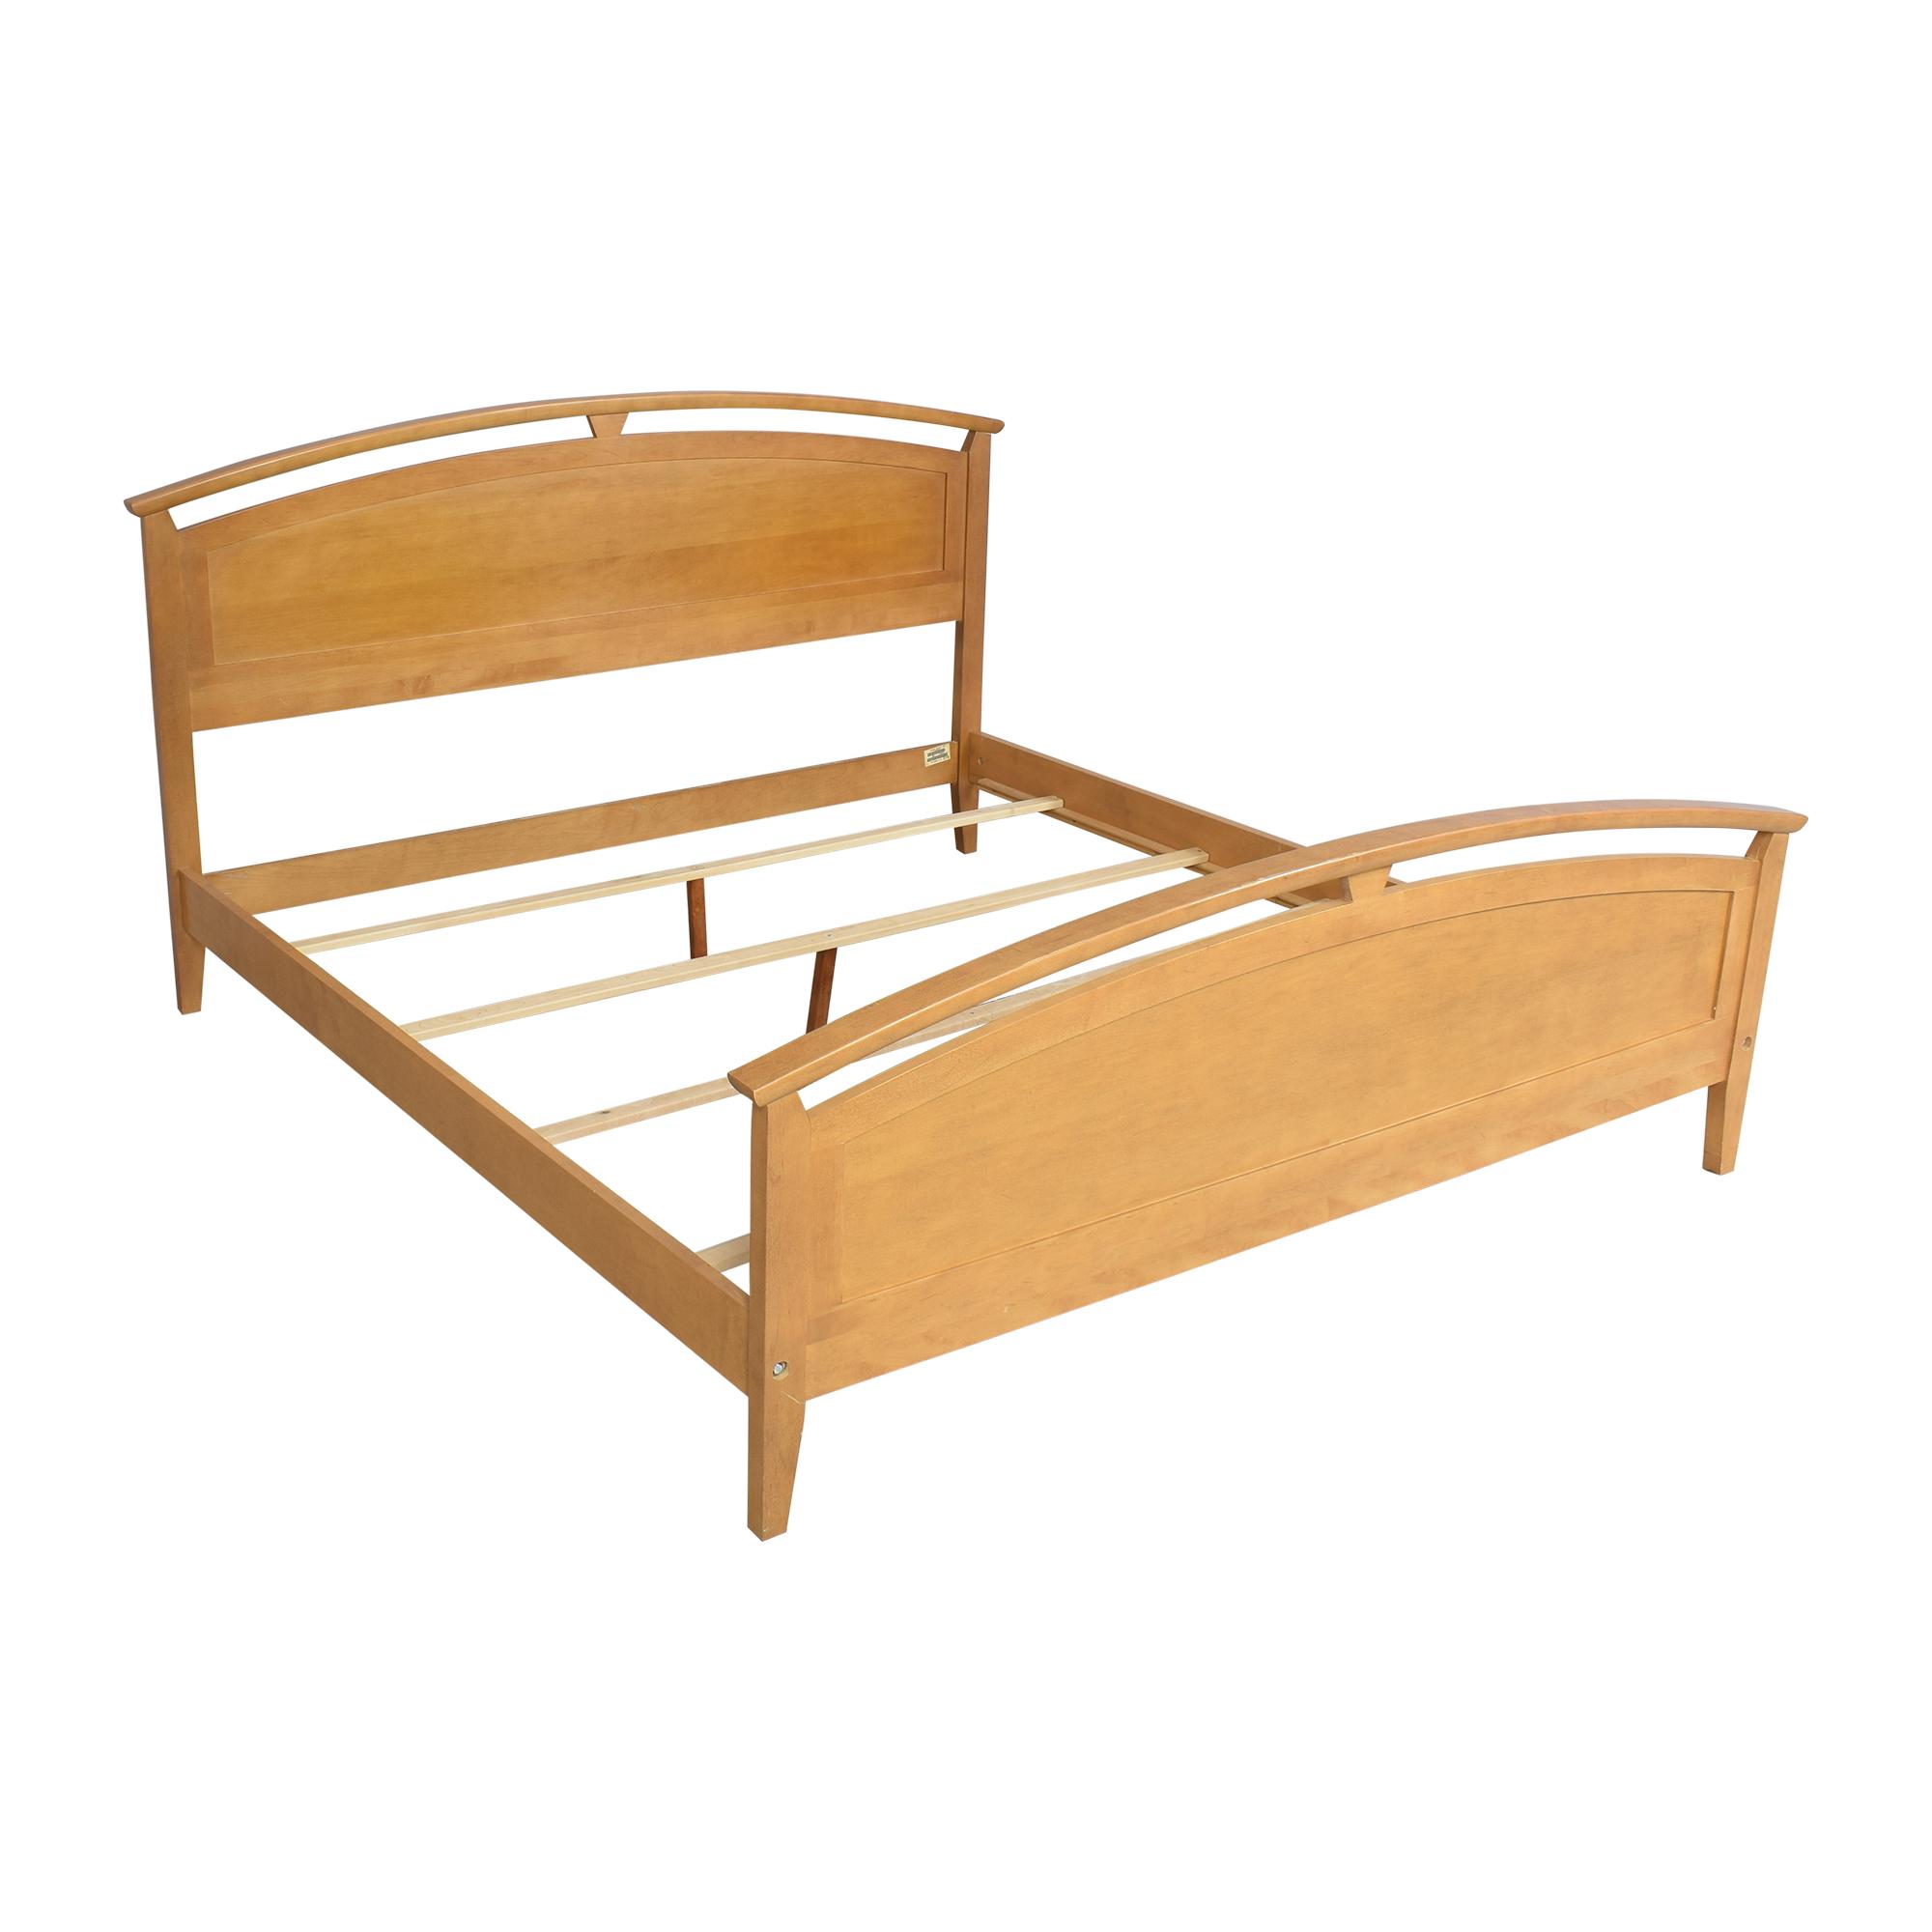 Ethan Allen Ethan Allen Elements King Bed used